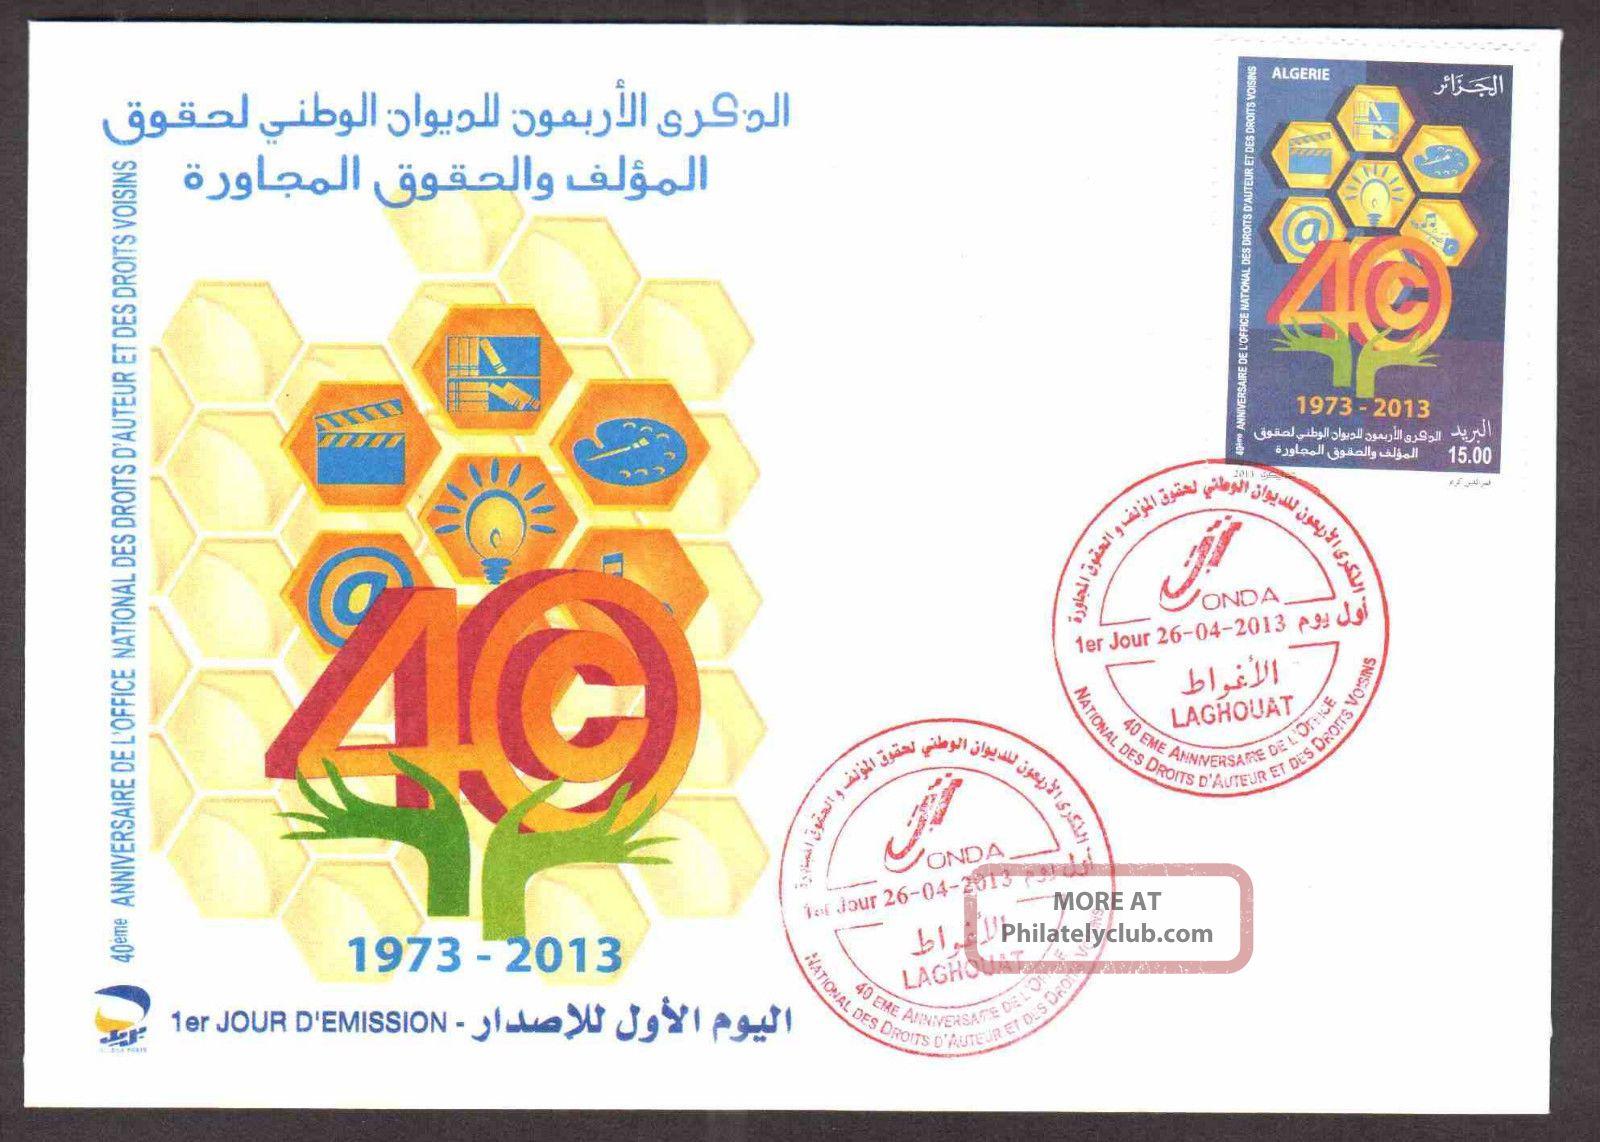 Algeria 2013 - Copyright & Intellectual Property - Apr 26th - Fdc,